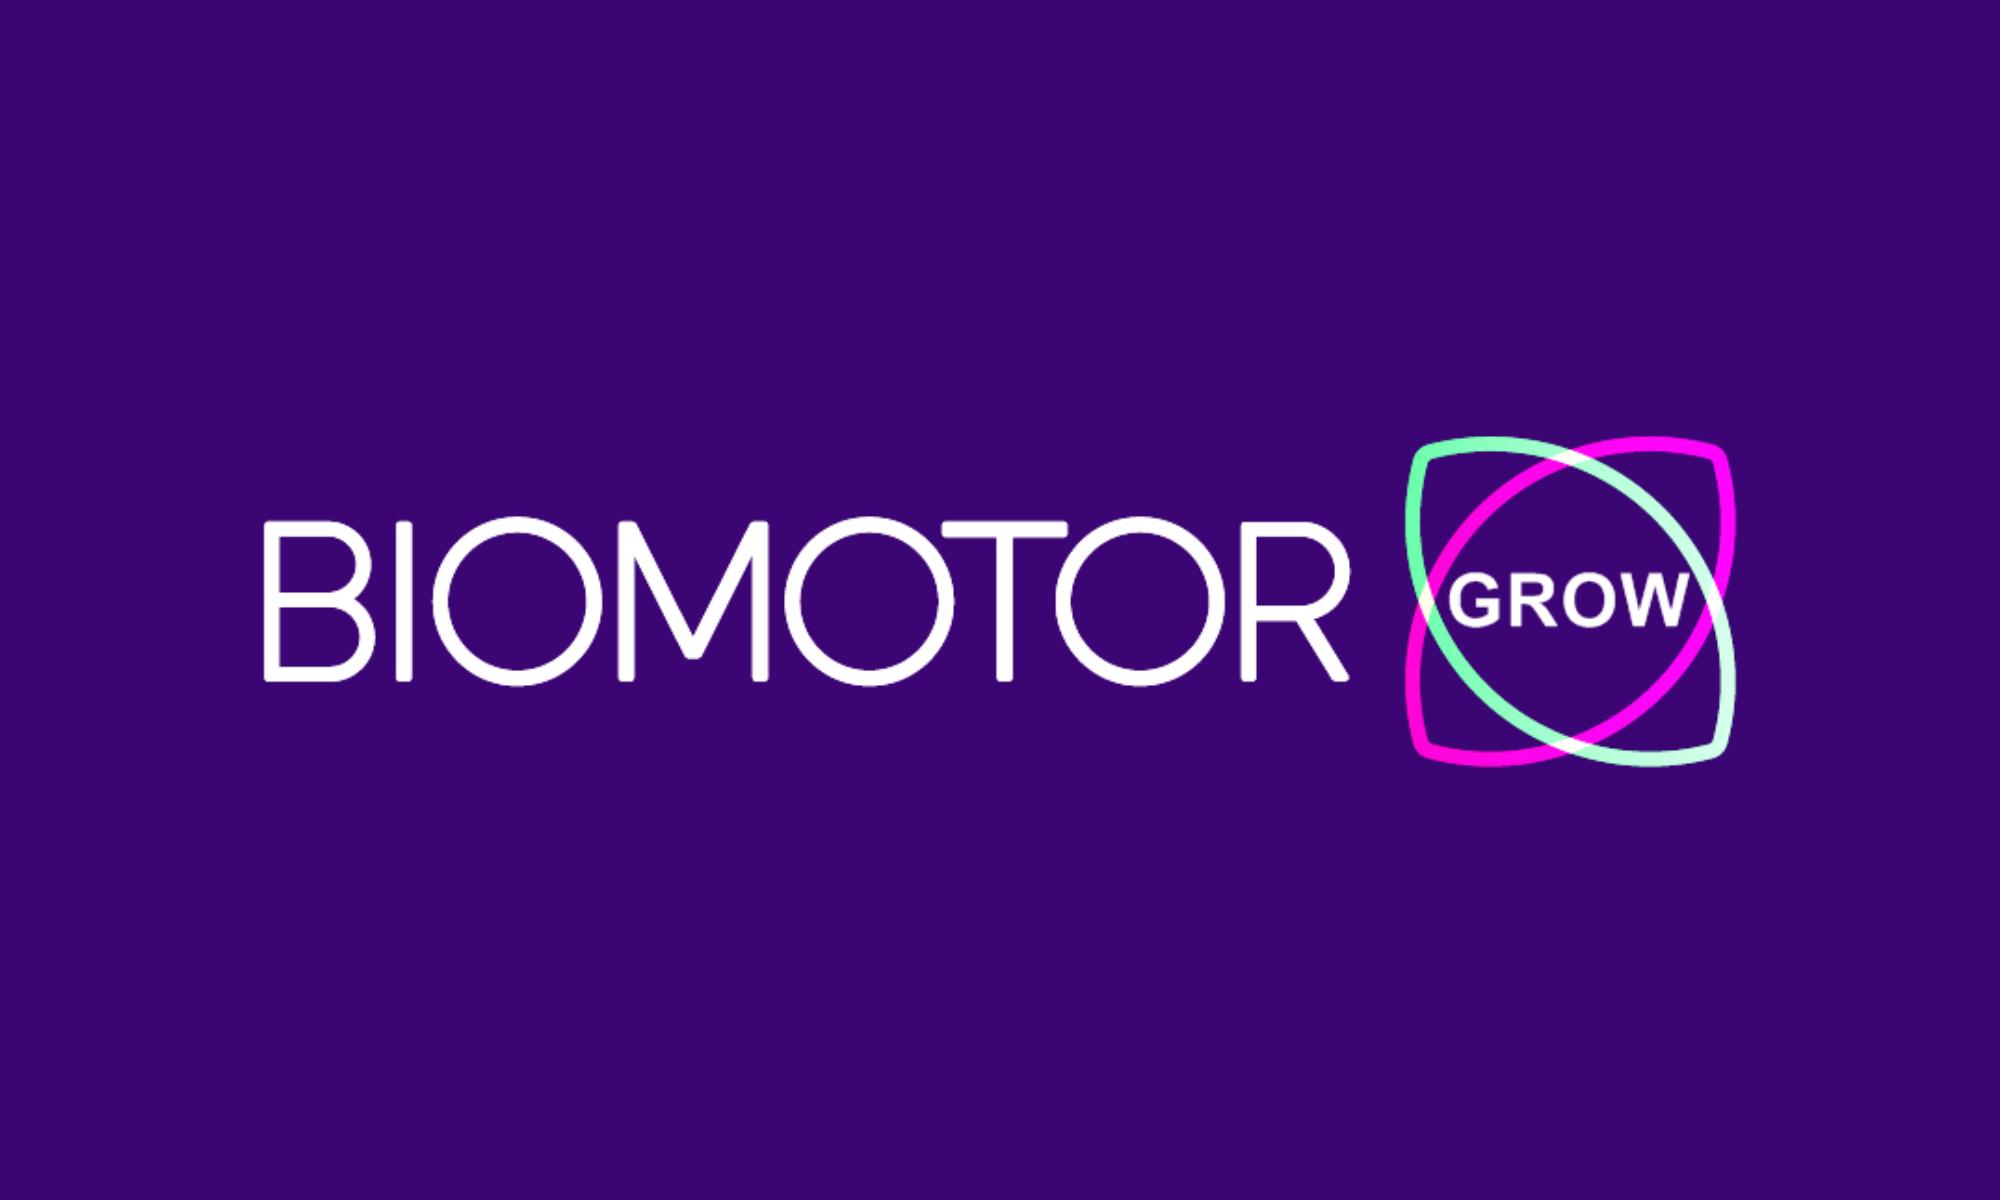 BIOMOTOR GROW